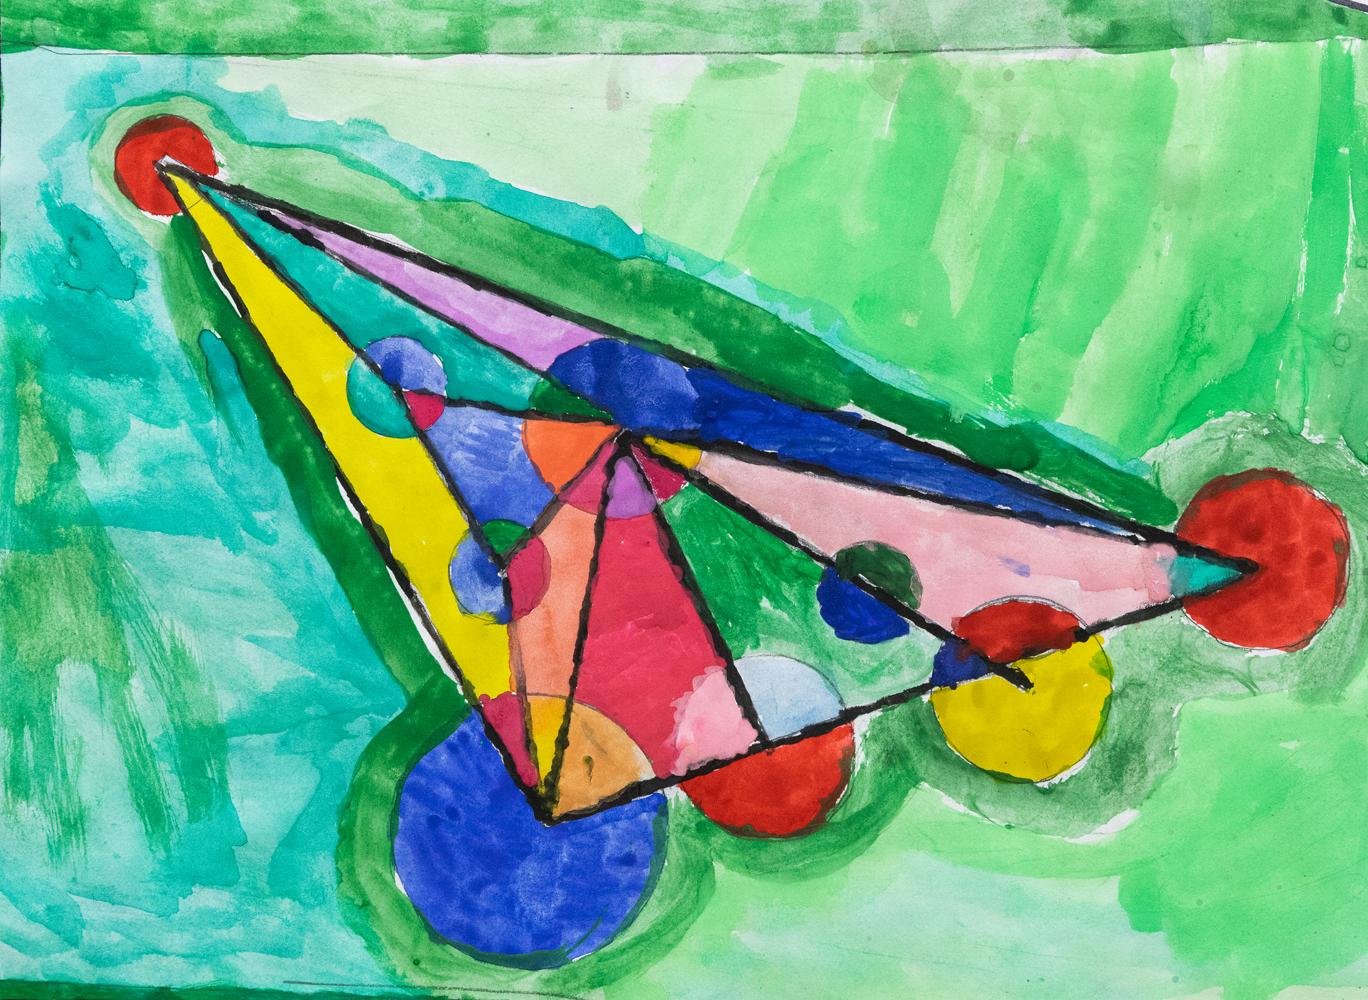 20. Danny Willey, 'Kandinsky', watercolour, Year 4, Drummond Memorial Public School